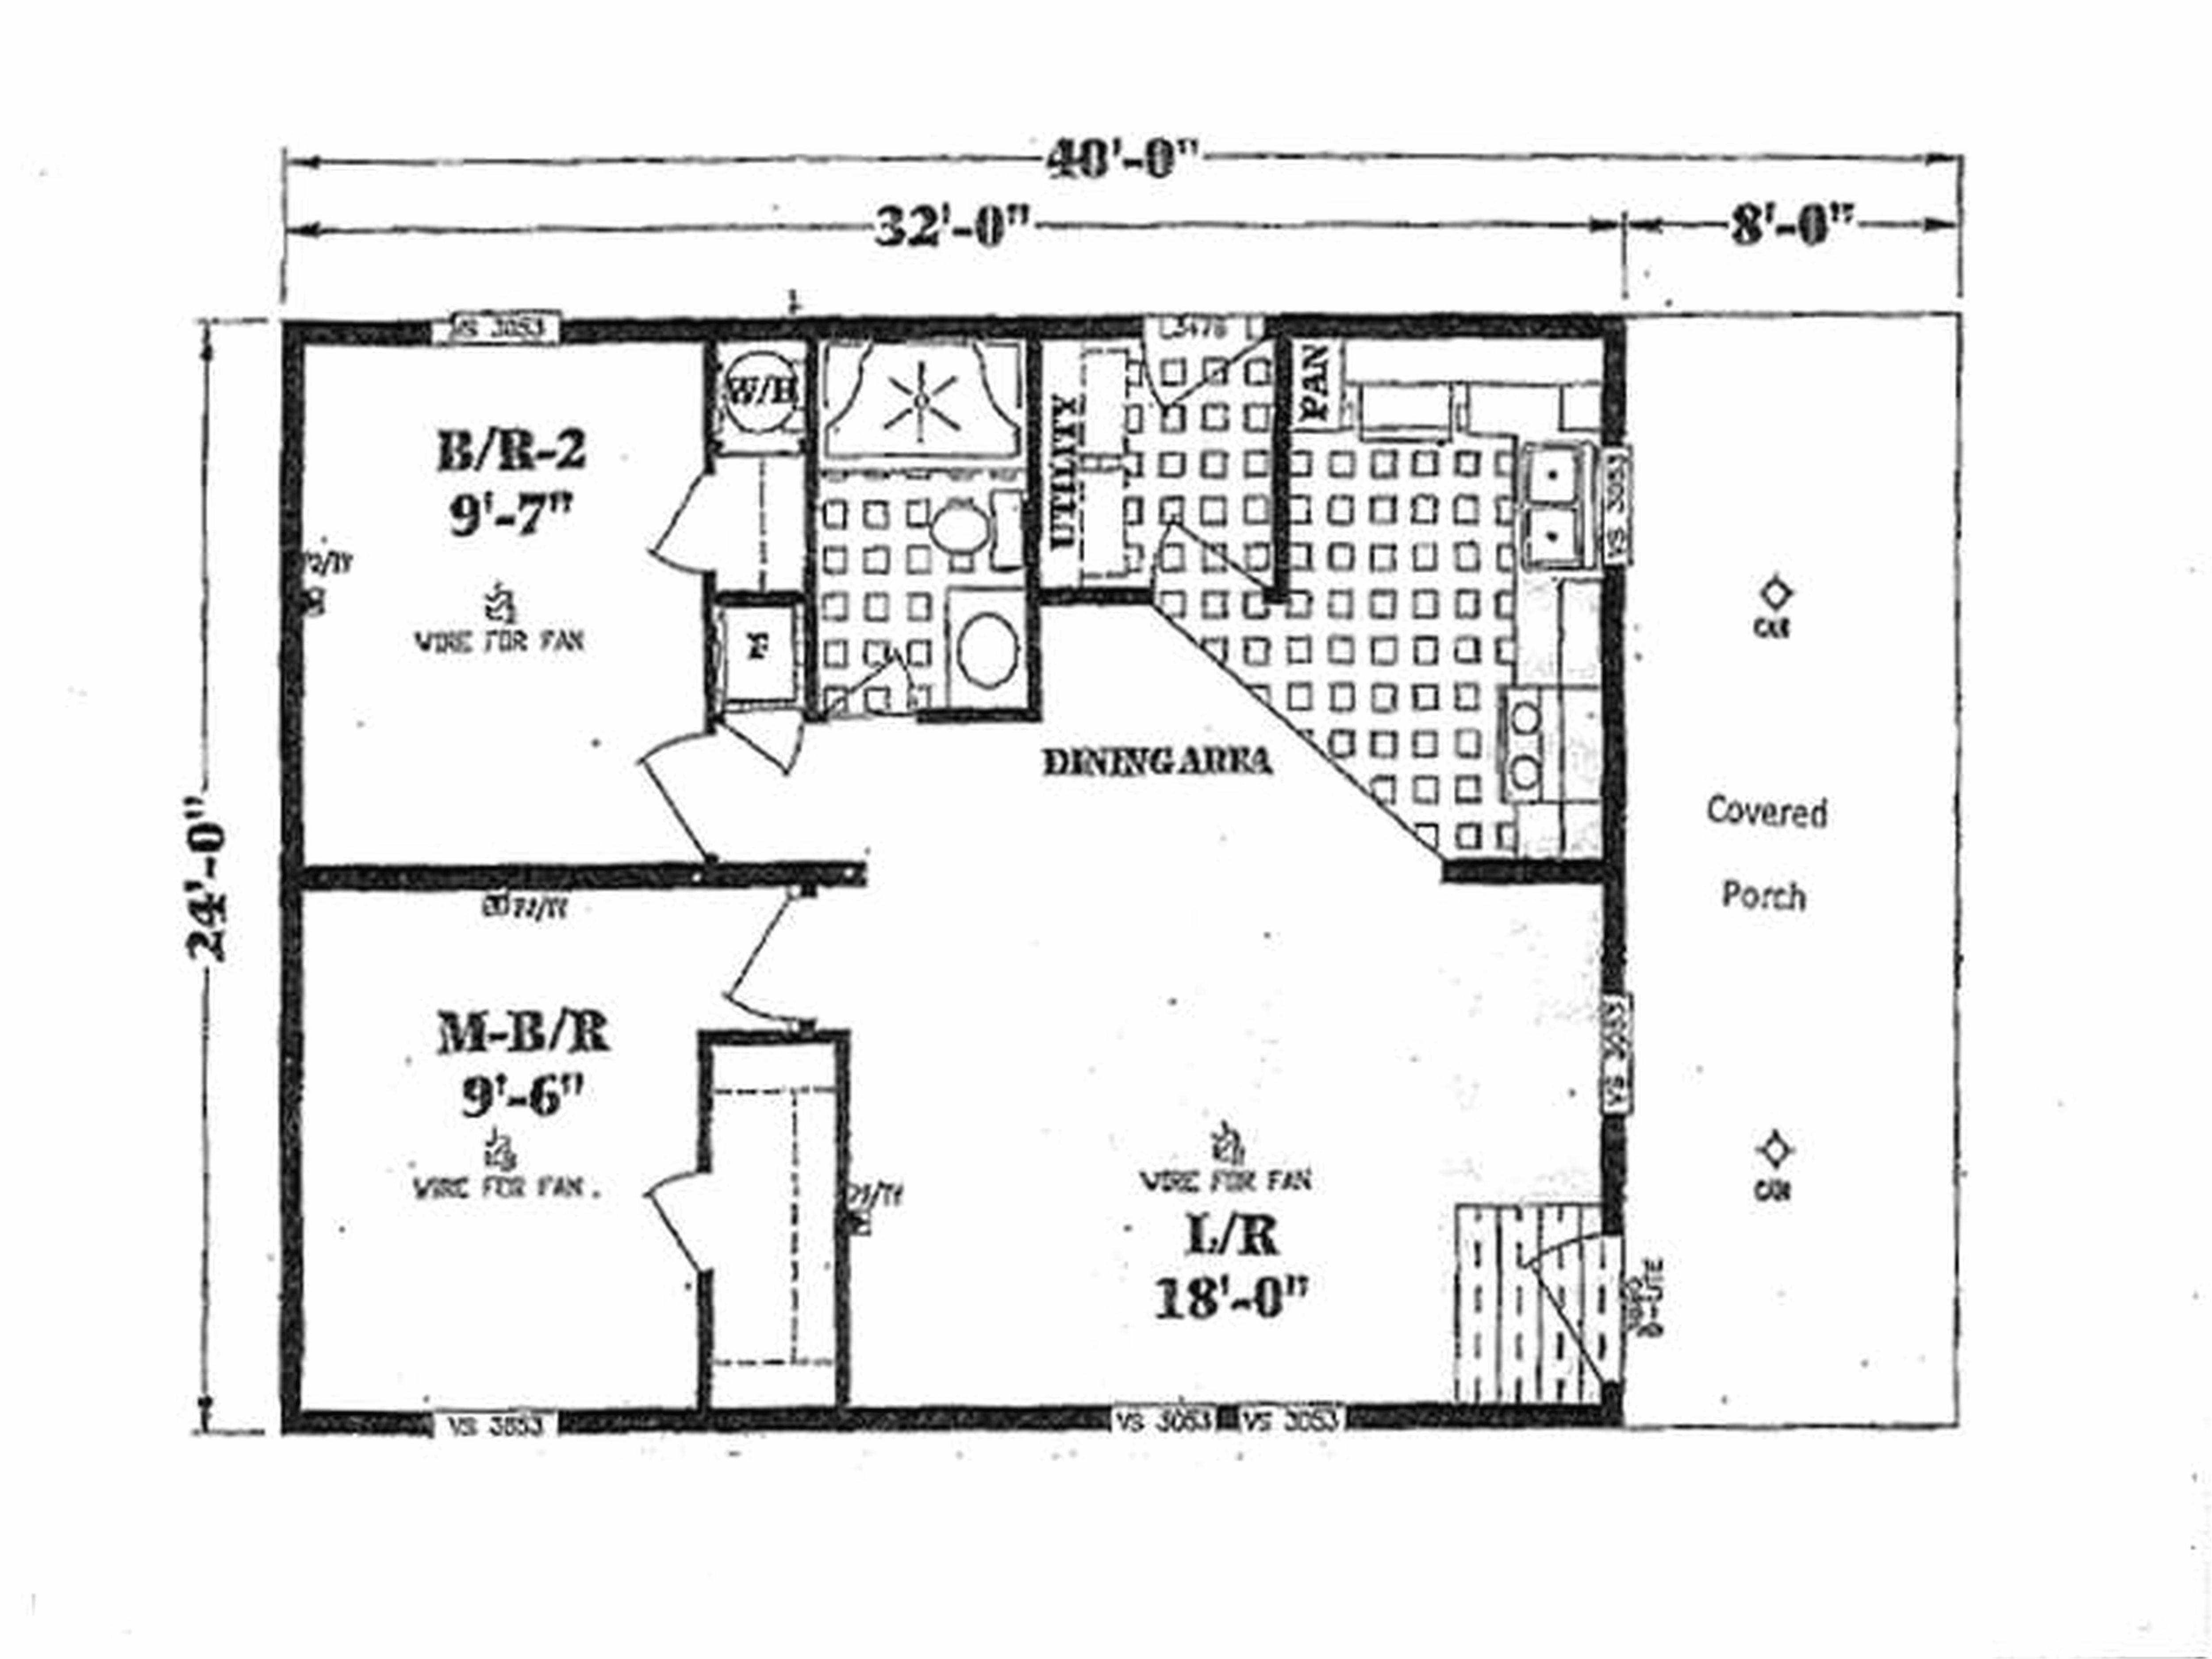 texas house plans good pole barn homes floor plans in ohio pricing texas columbus houses